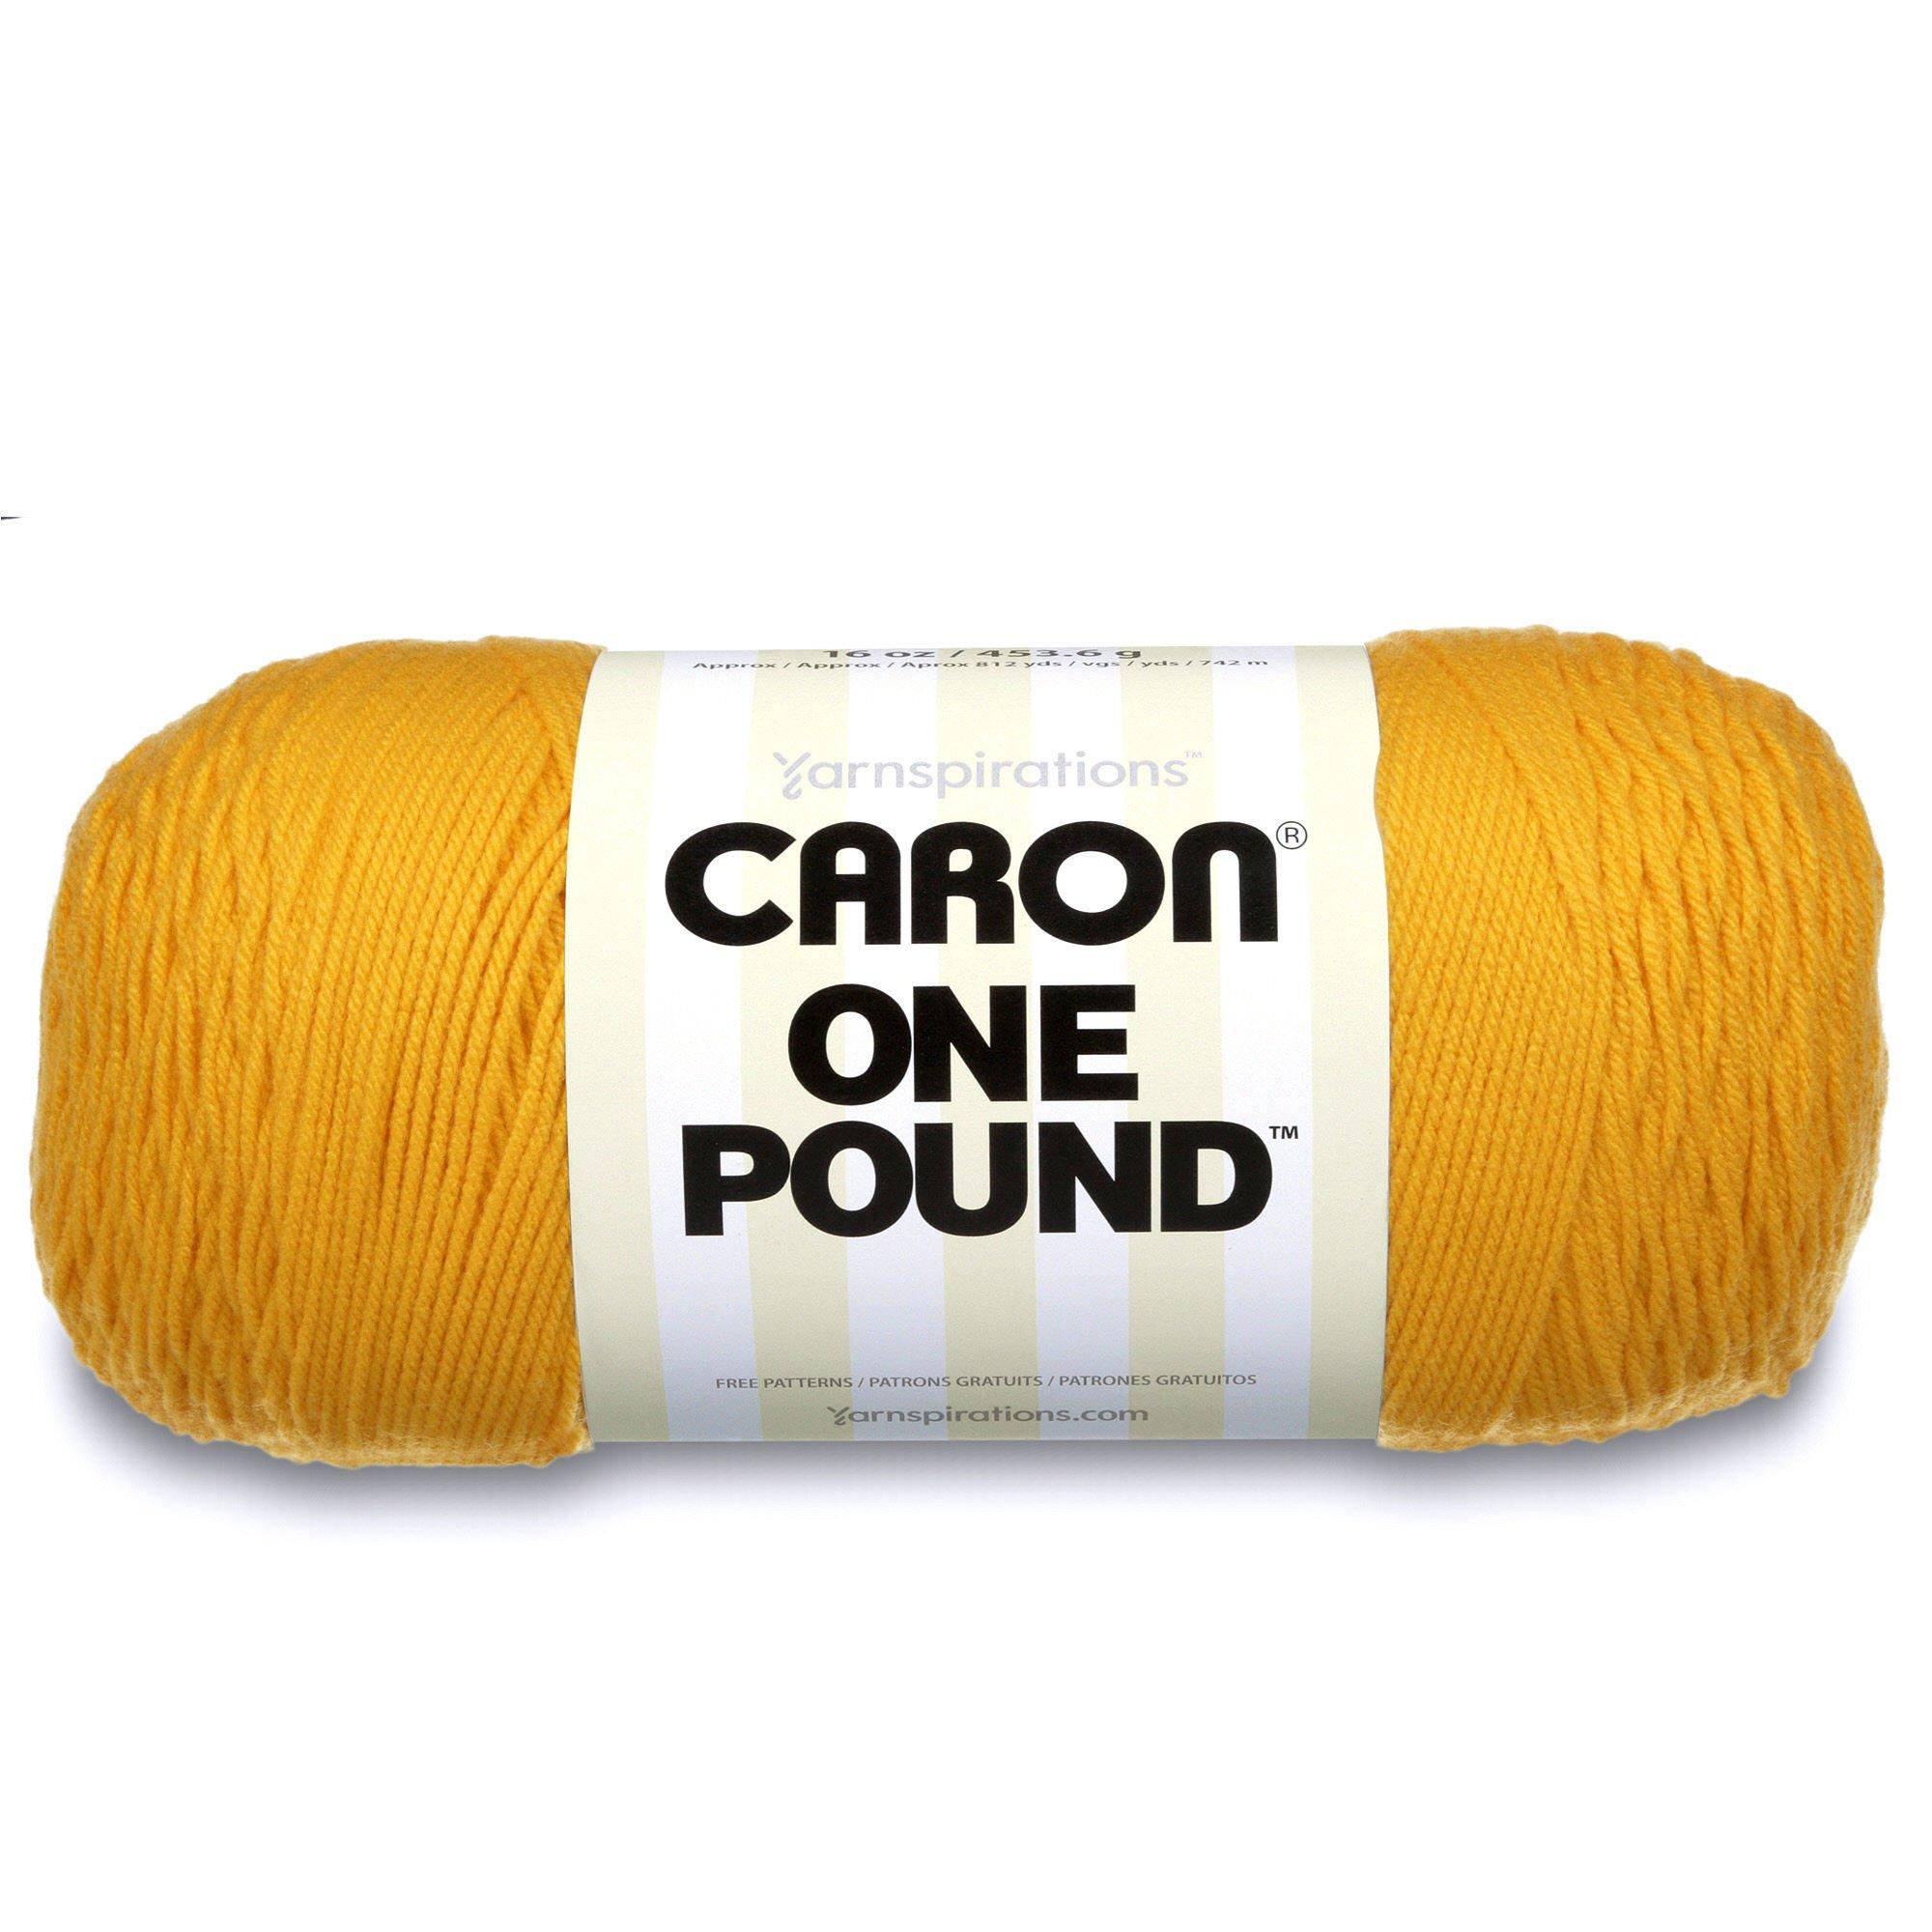 Caron  One Pound Solids Yarn - (4) Medium Gauge 100% Acrylic - 16 oz -  Sunflower- For Crochet, Knitting & Crafting  ( 1 Piece )